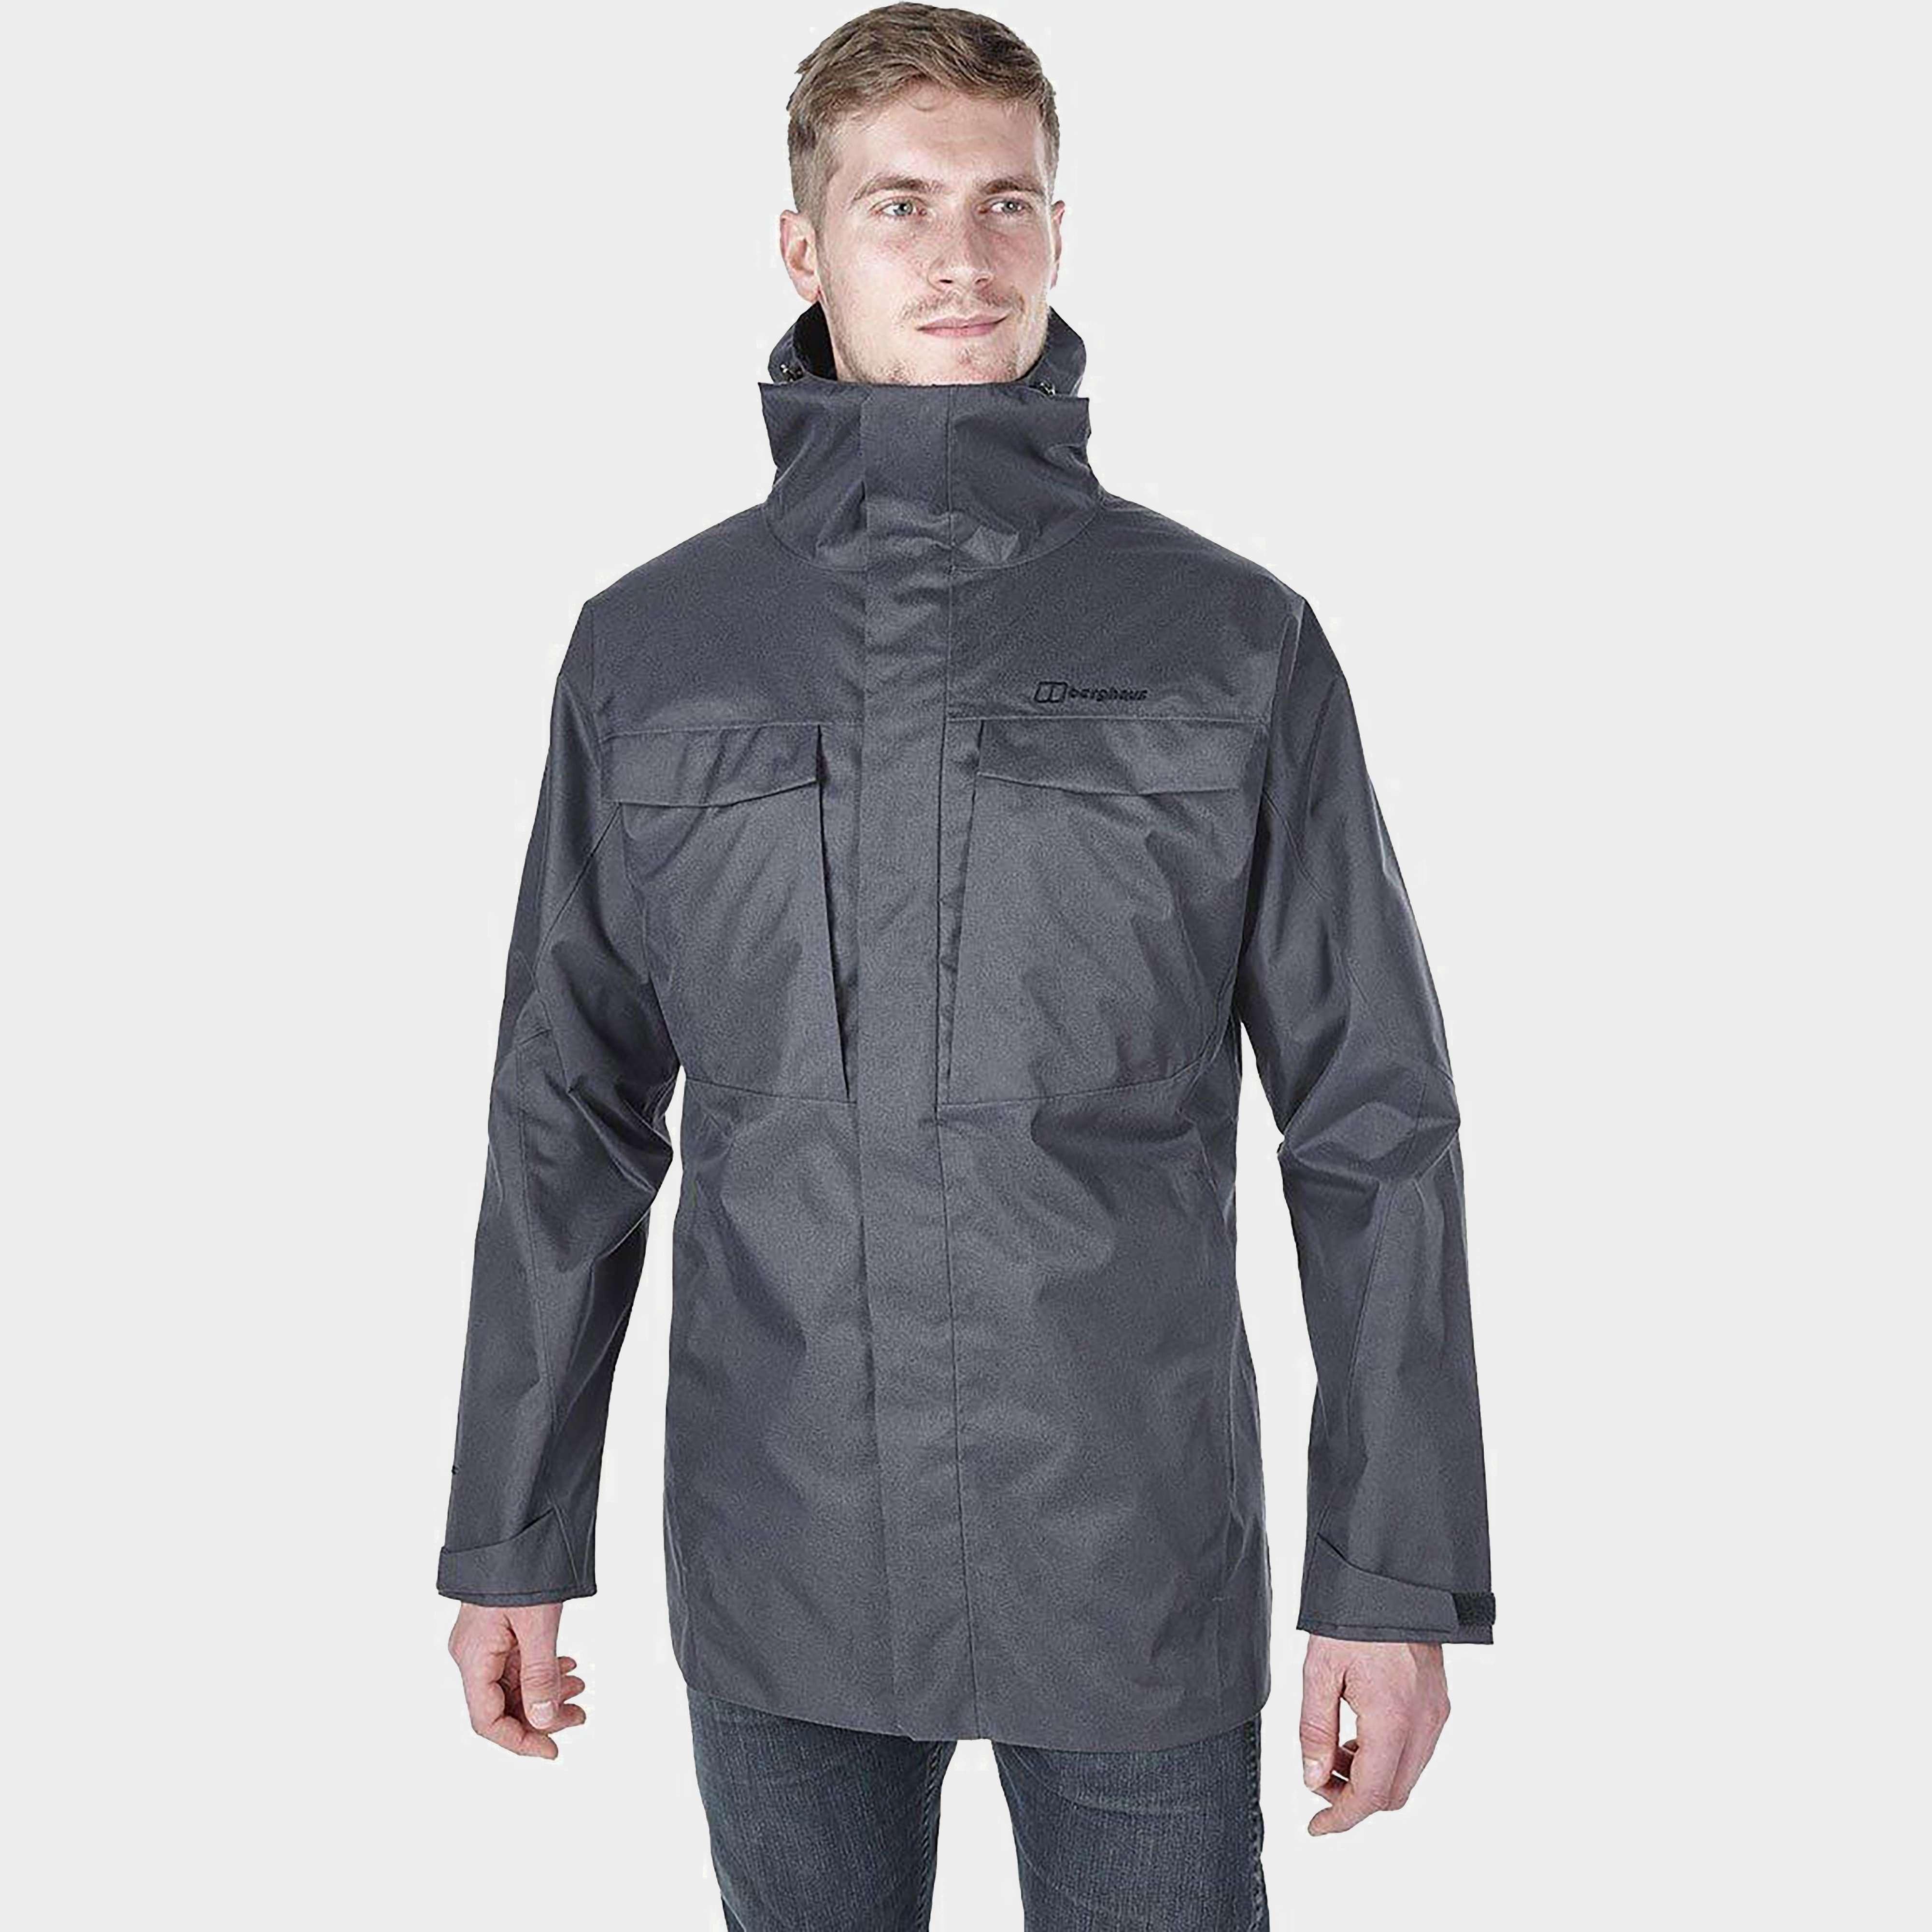 BERGHAUS Men's Ruction 2.0 Waterproof Jacket